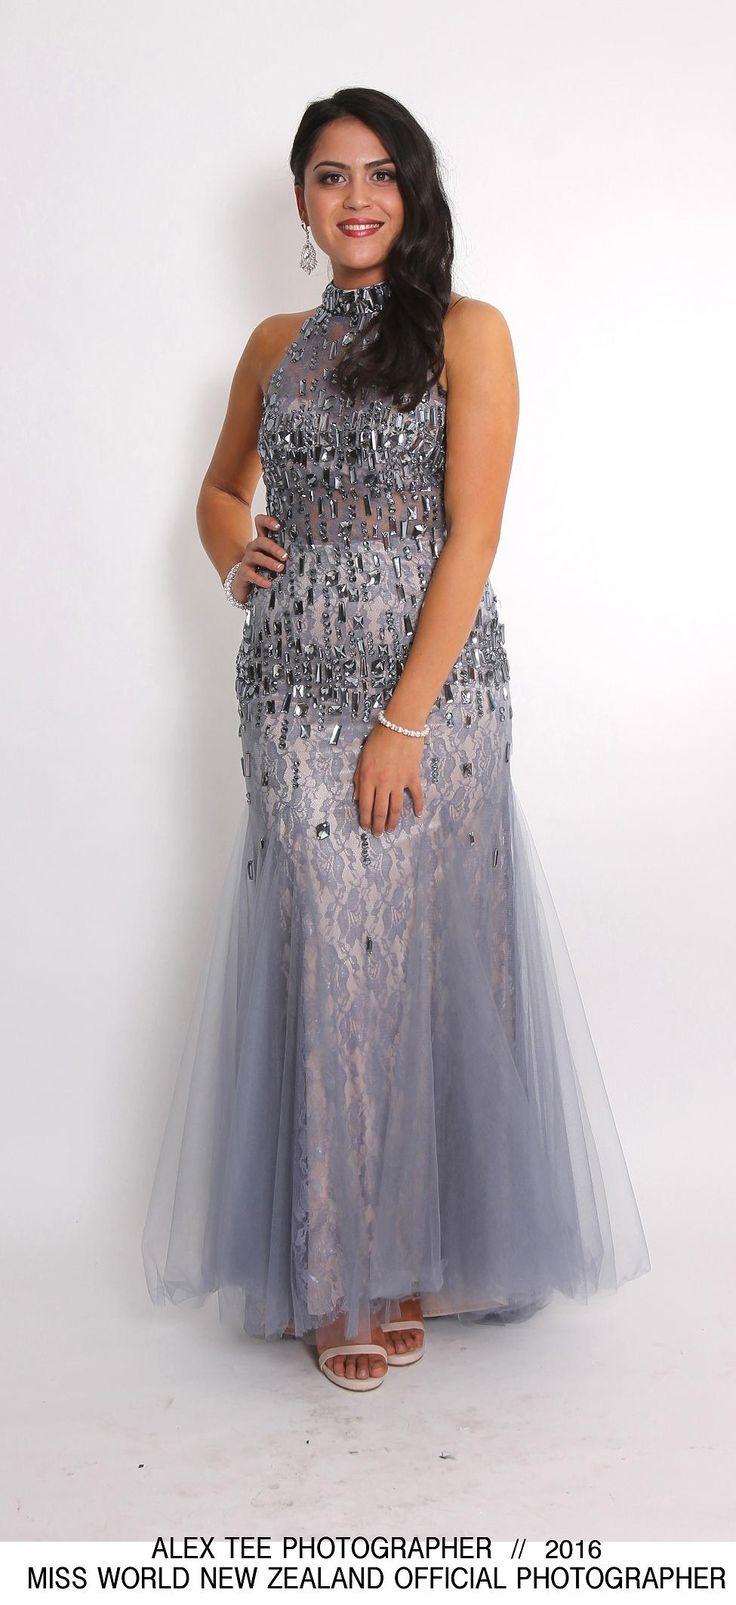 Chantel - Miss World New Zealand 2016 Finalist. Evening gown by Bridal and Ball NZ